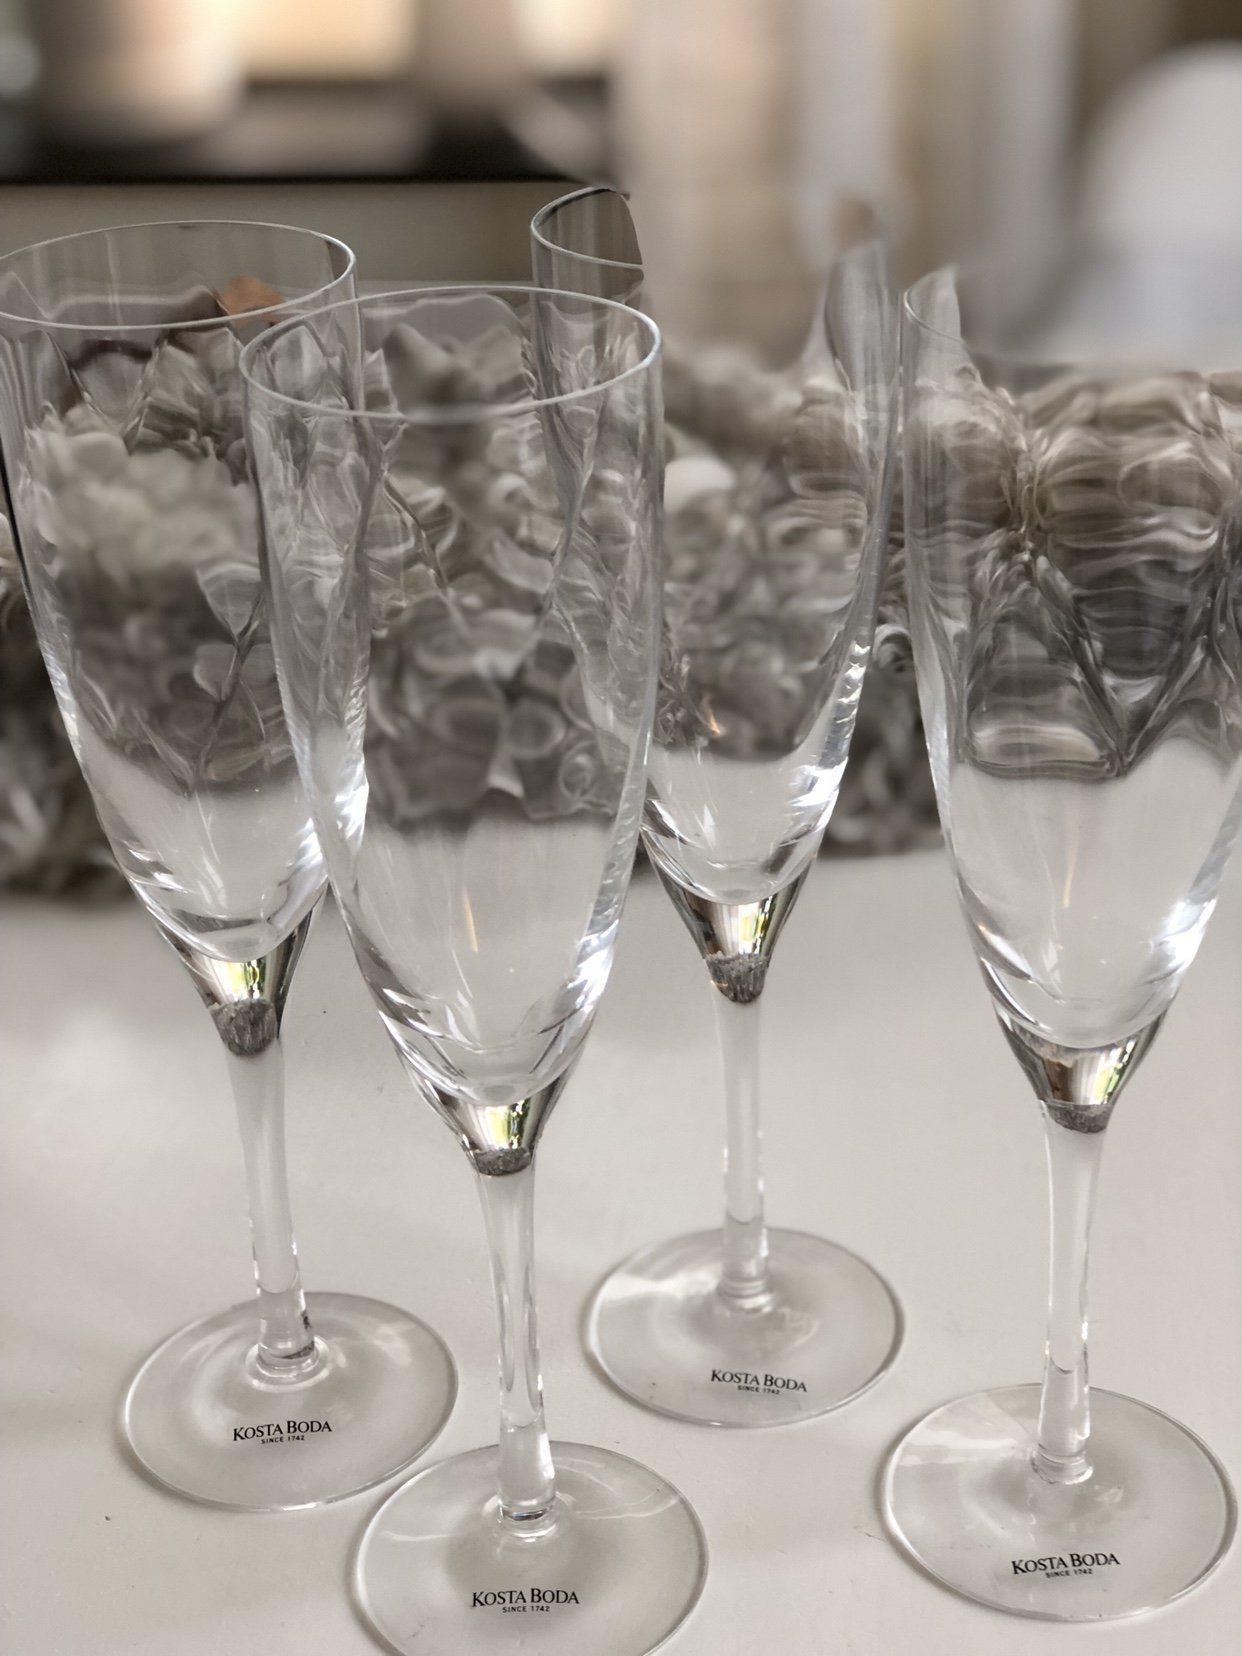 Utroligt Kosta Boda Chateau Champagneglas 4 st (343220899) ᐈ Köp på Tradera UJ94